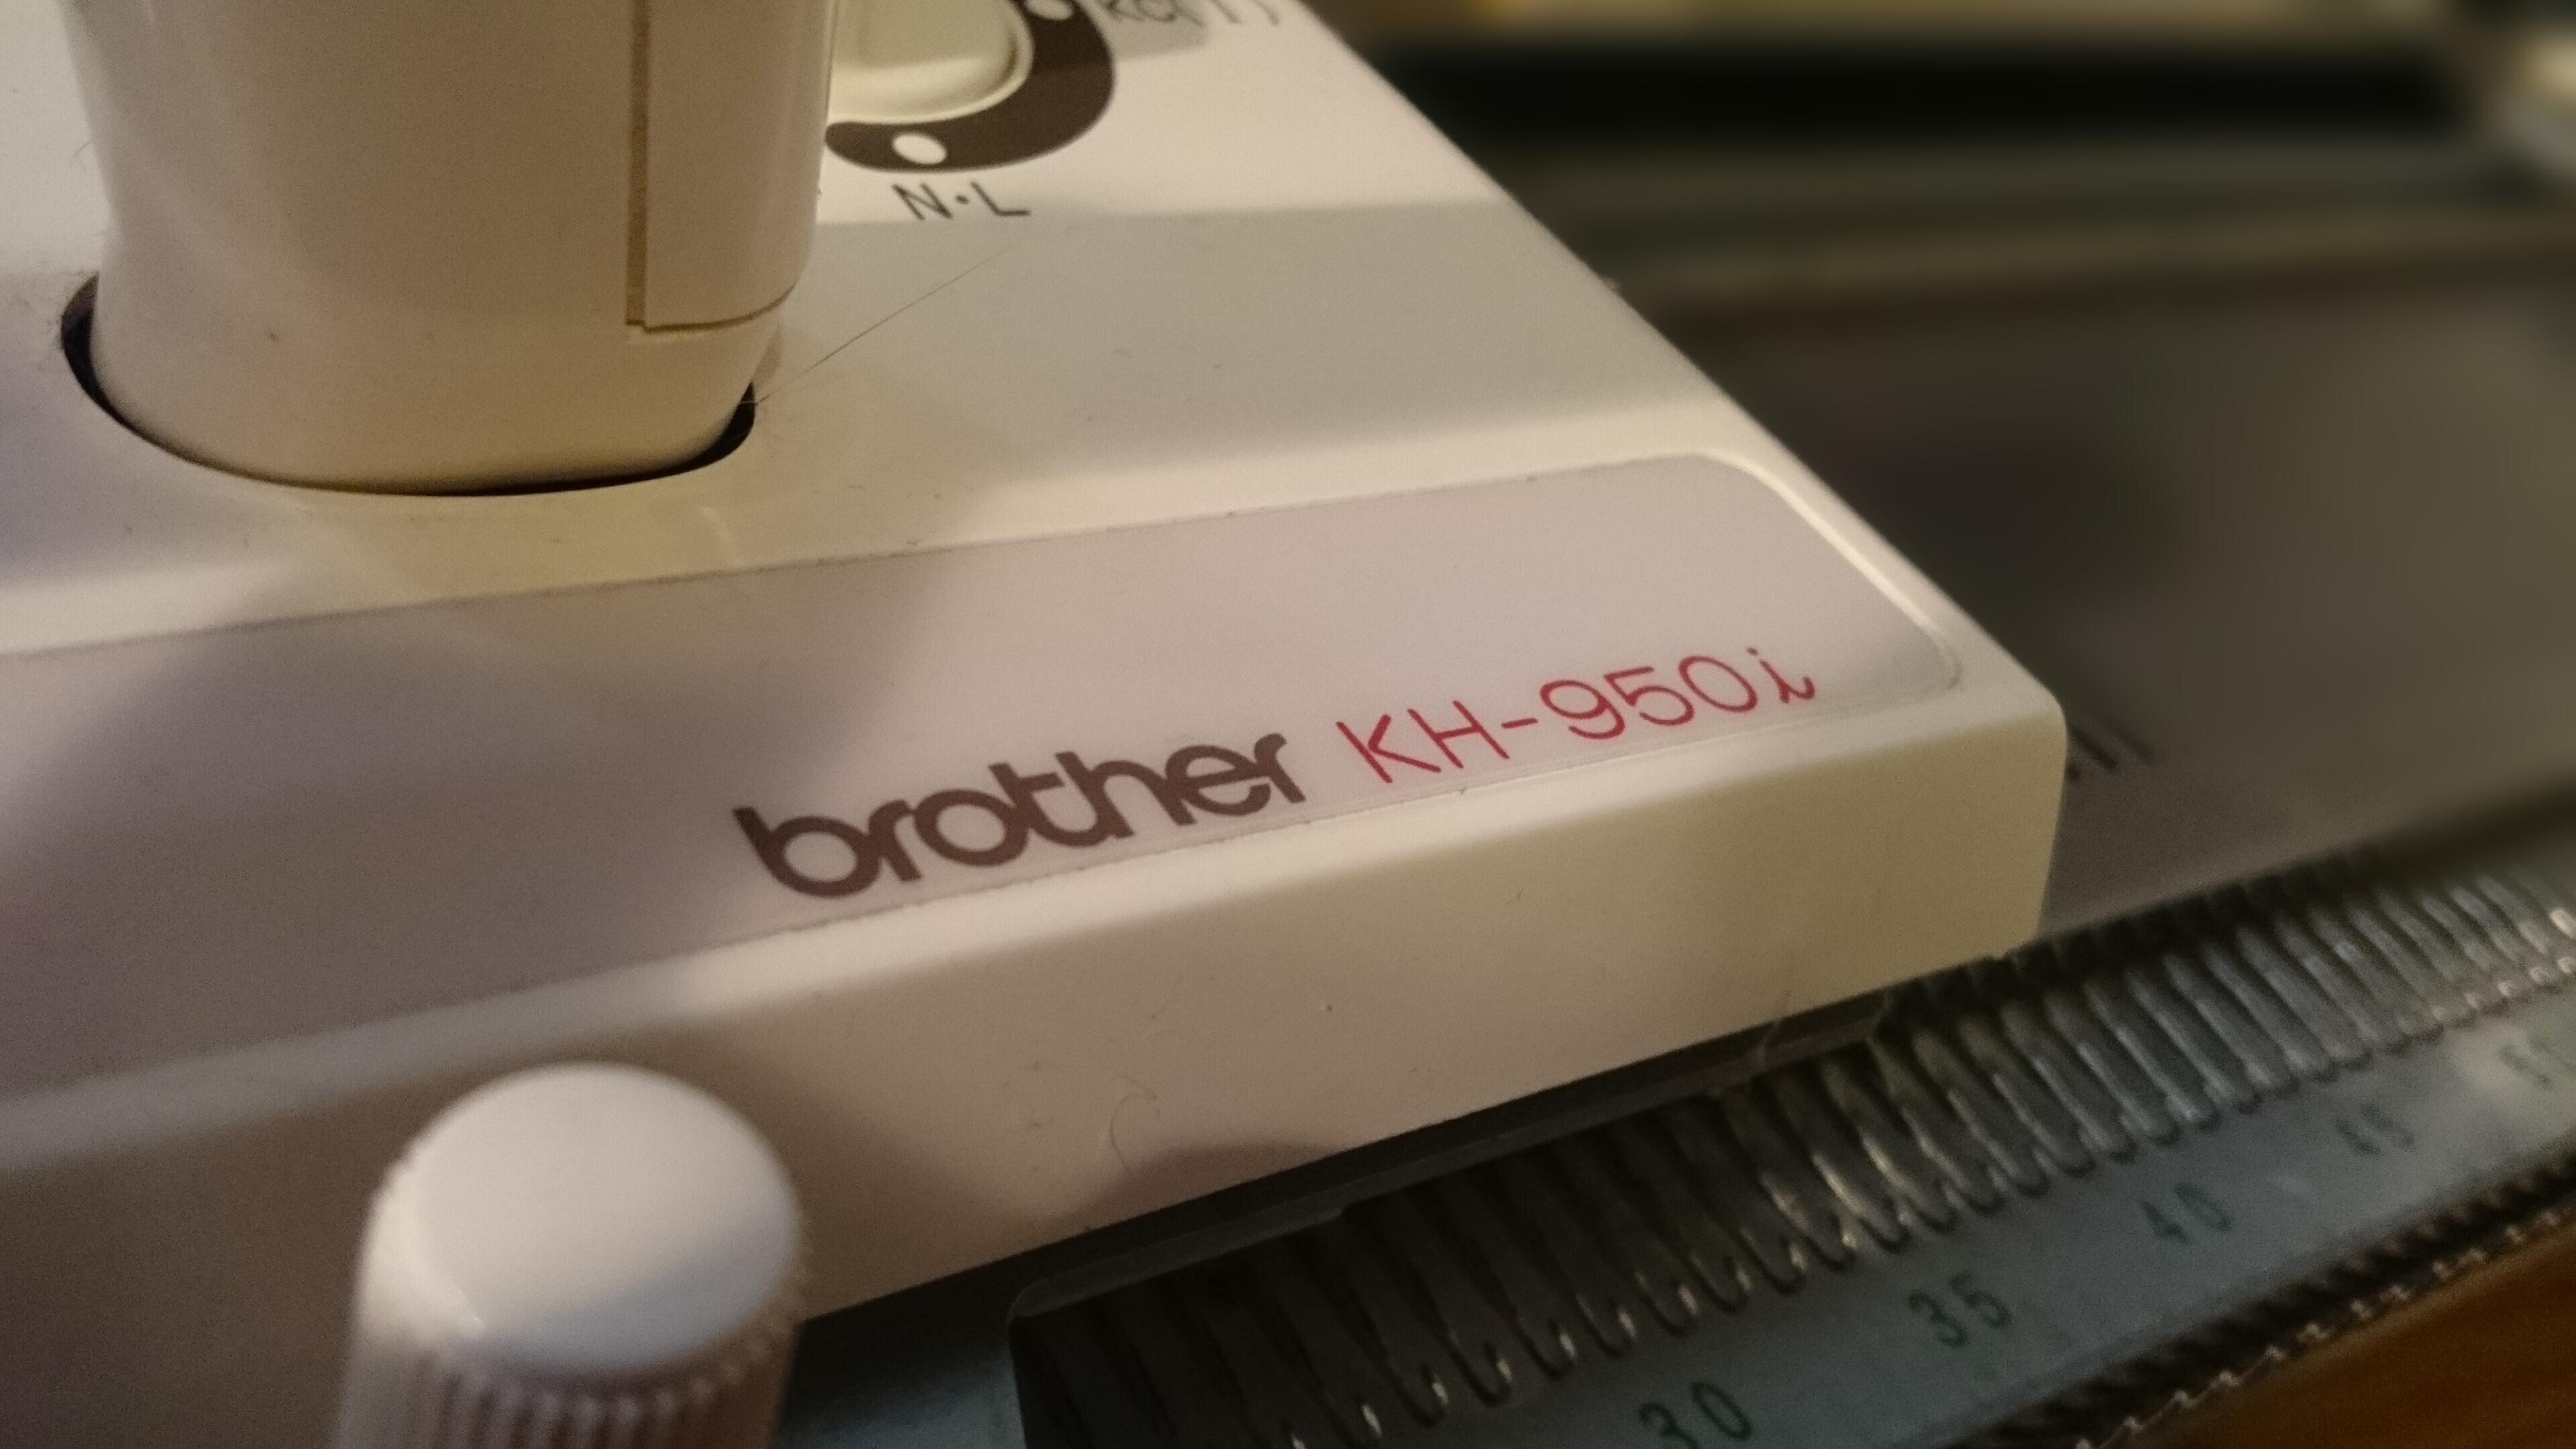 Brother KH-950i